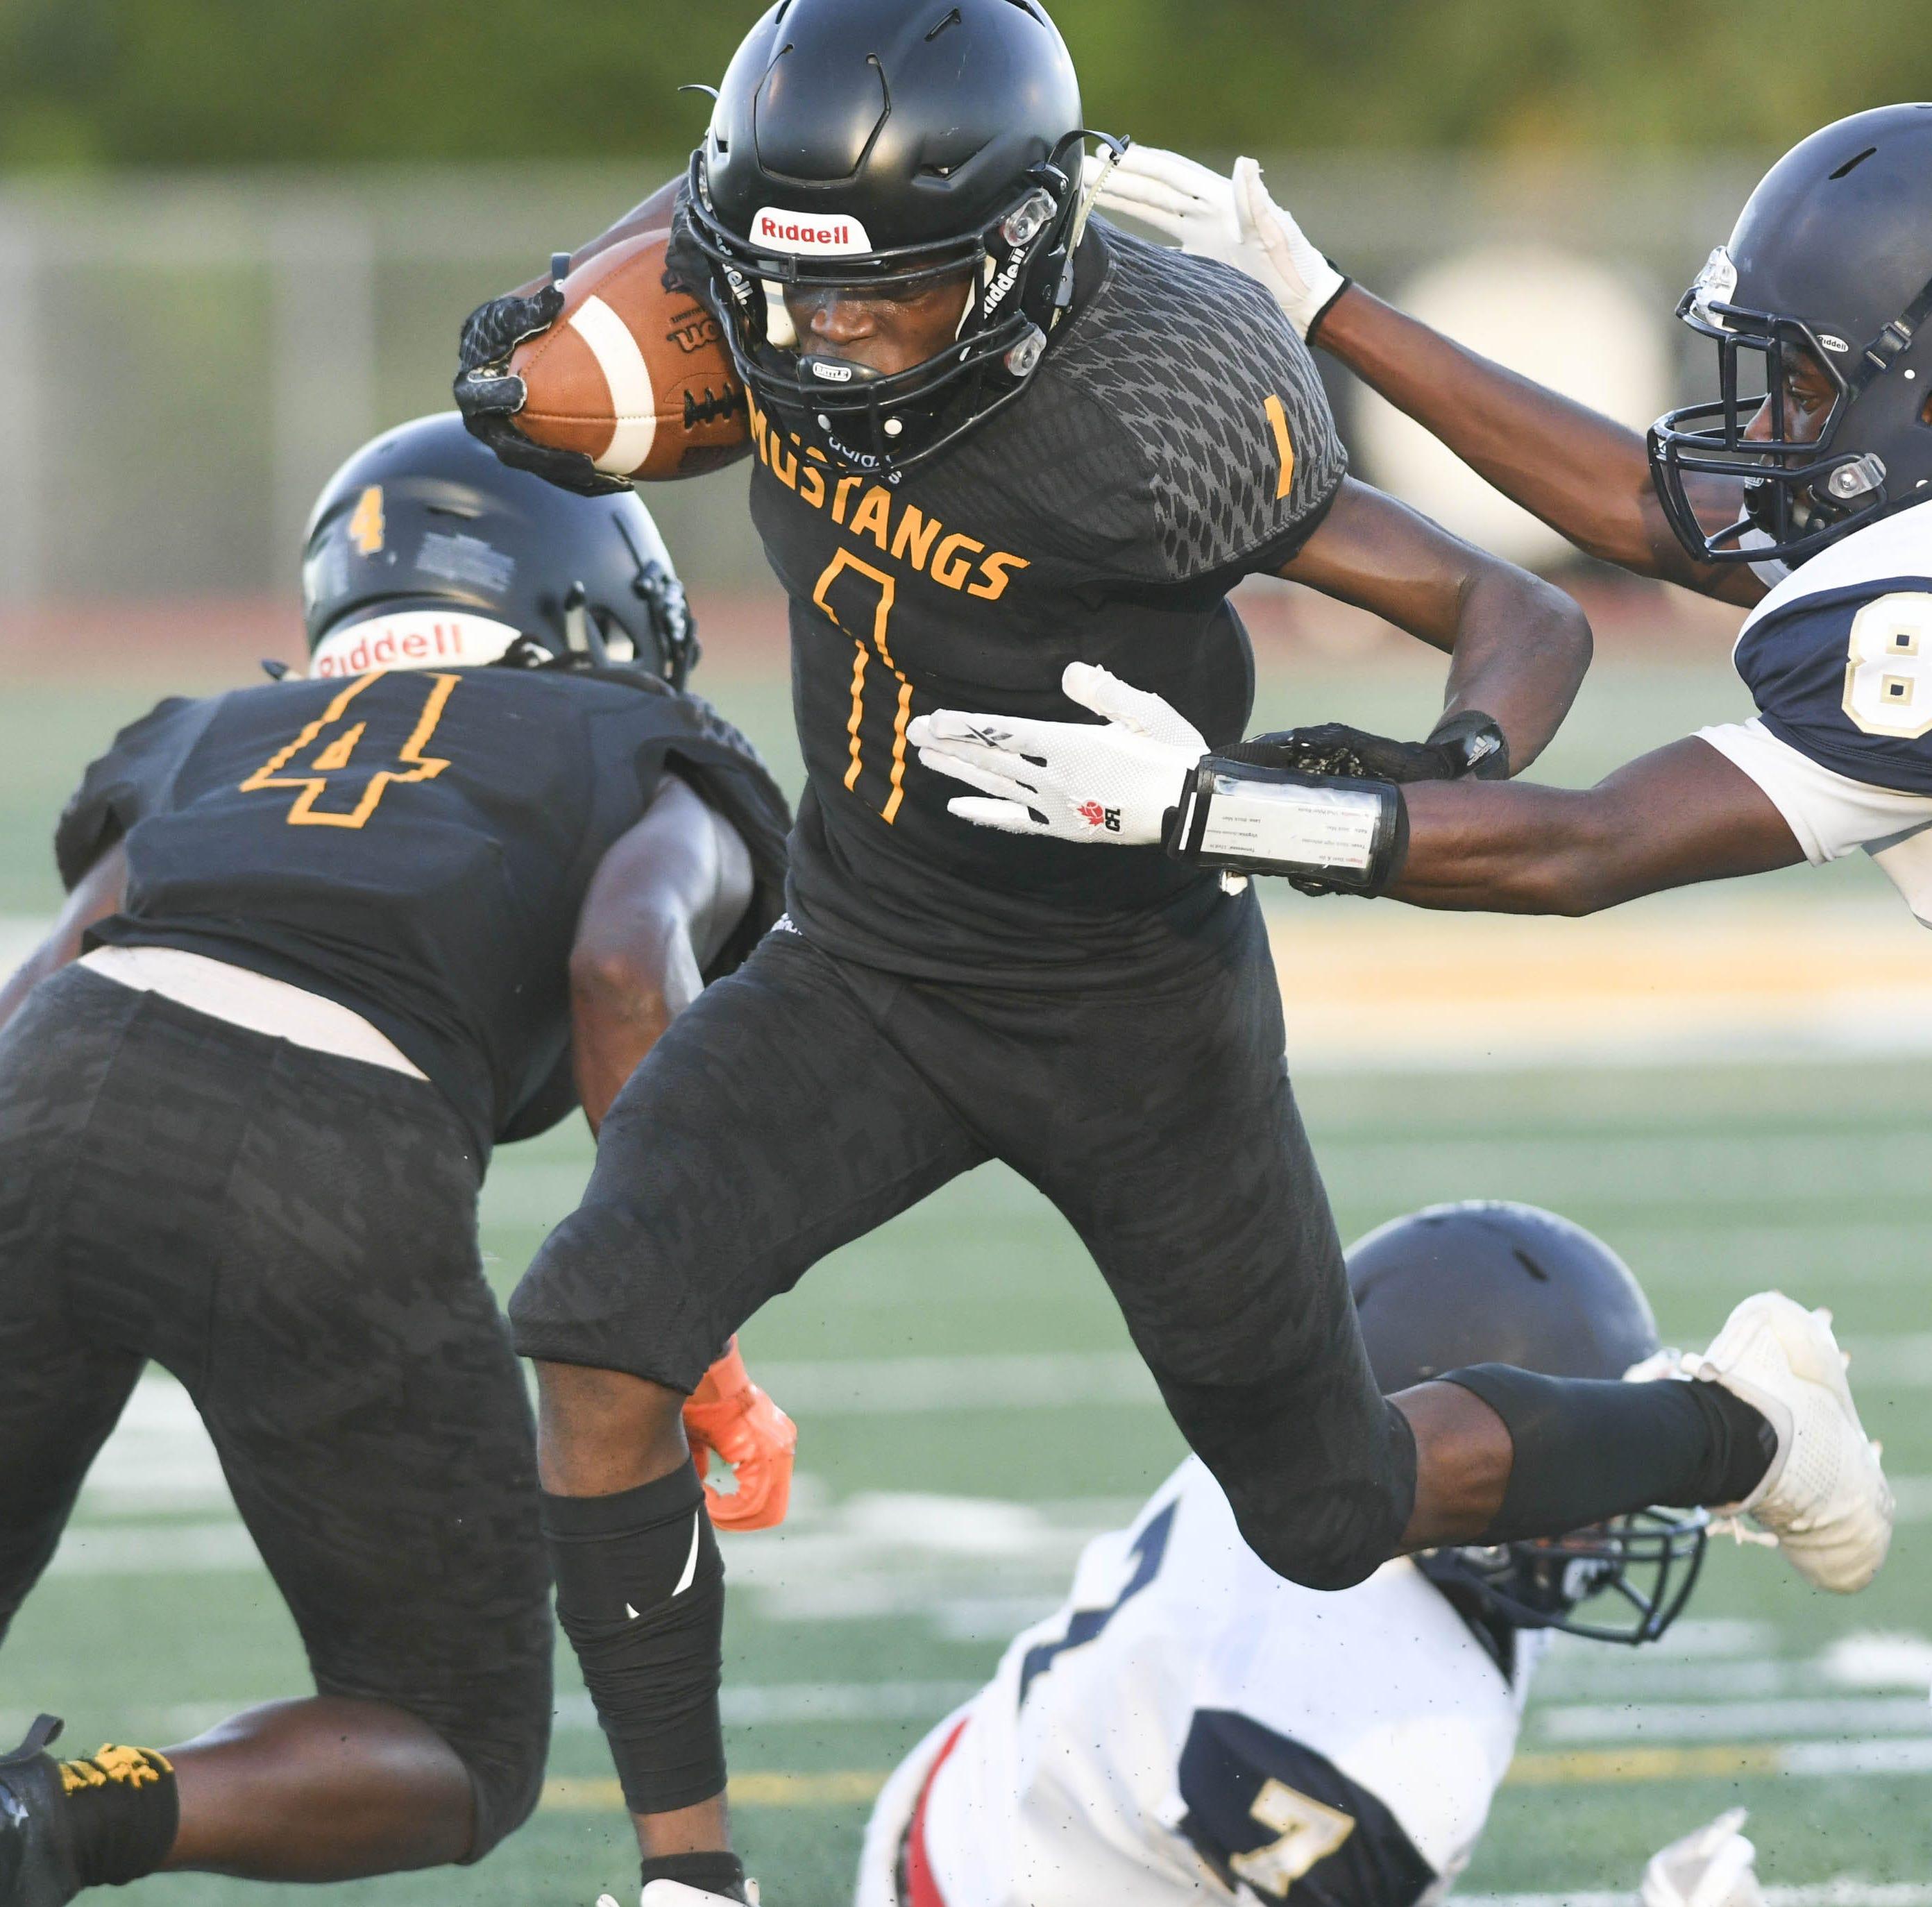 Brevard teams see shakeup in district football alignment